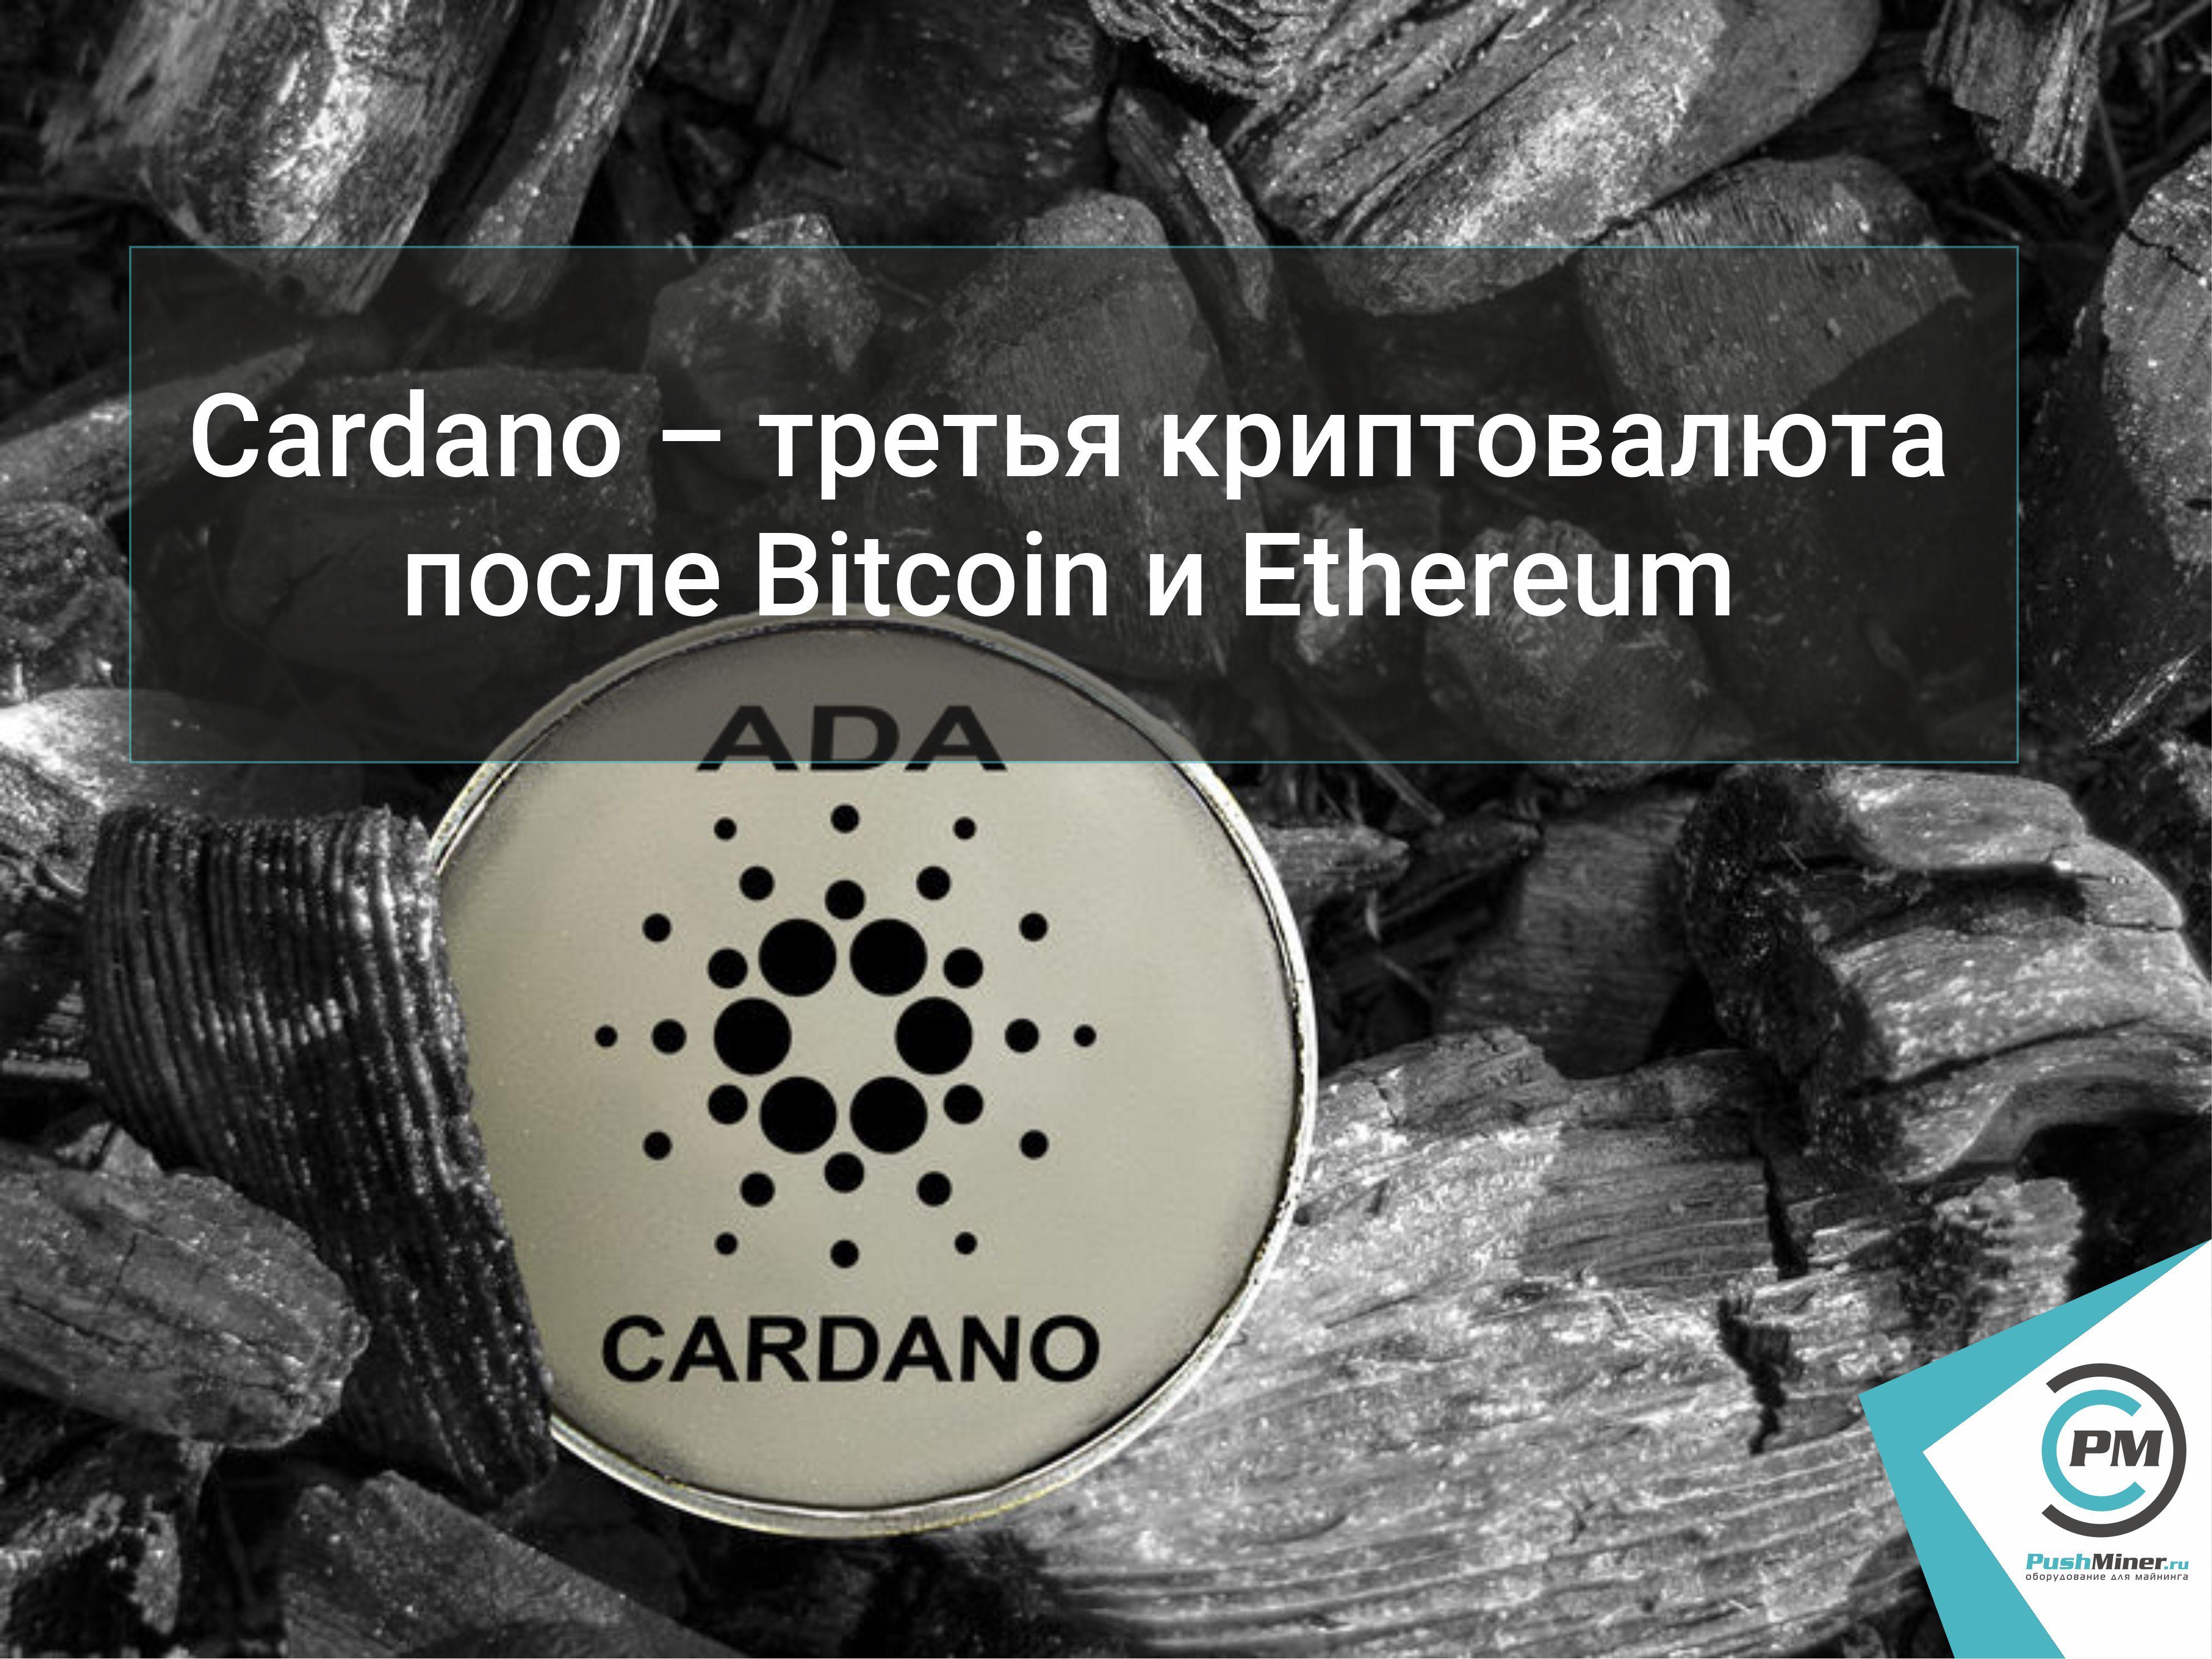 Cardano – третья криптовалюта после Bitcoin и Ethereum